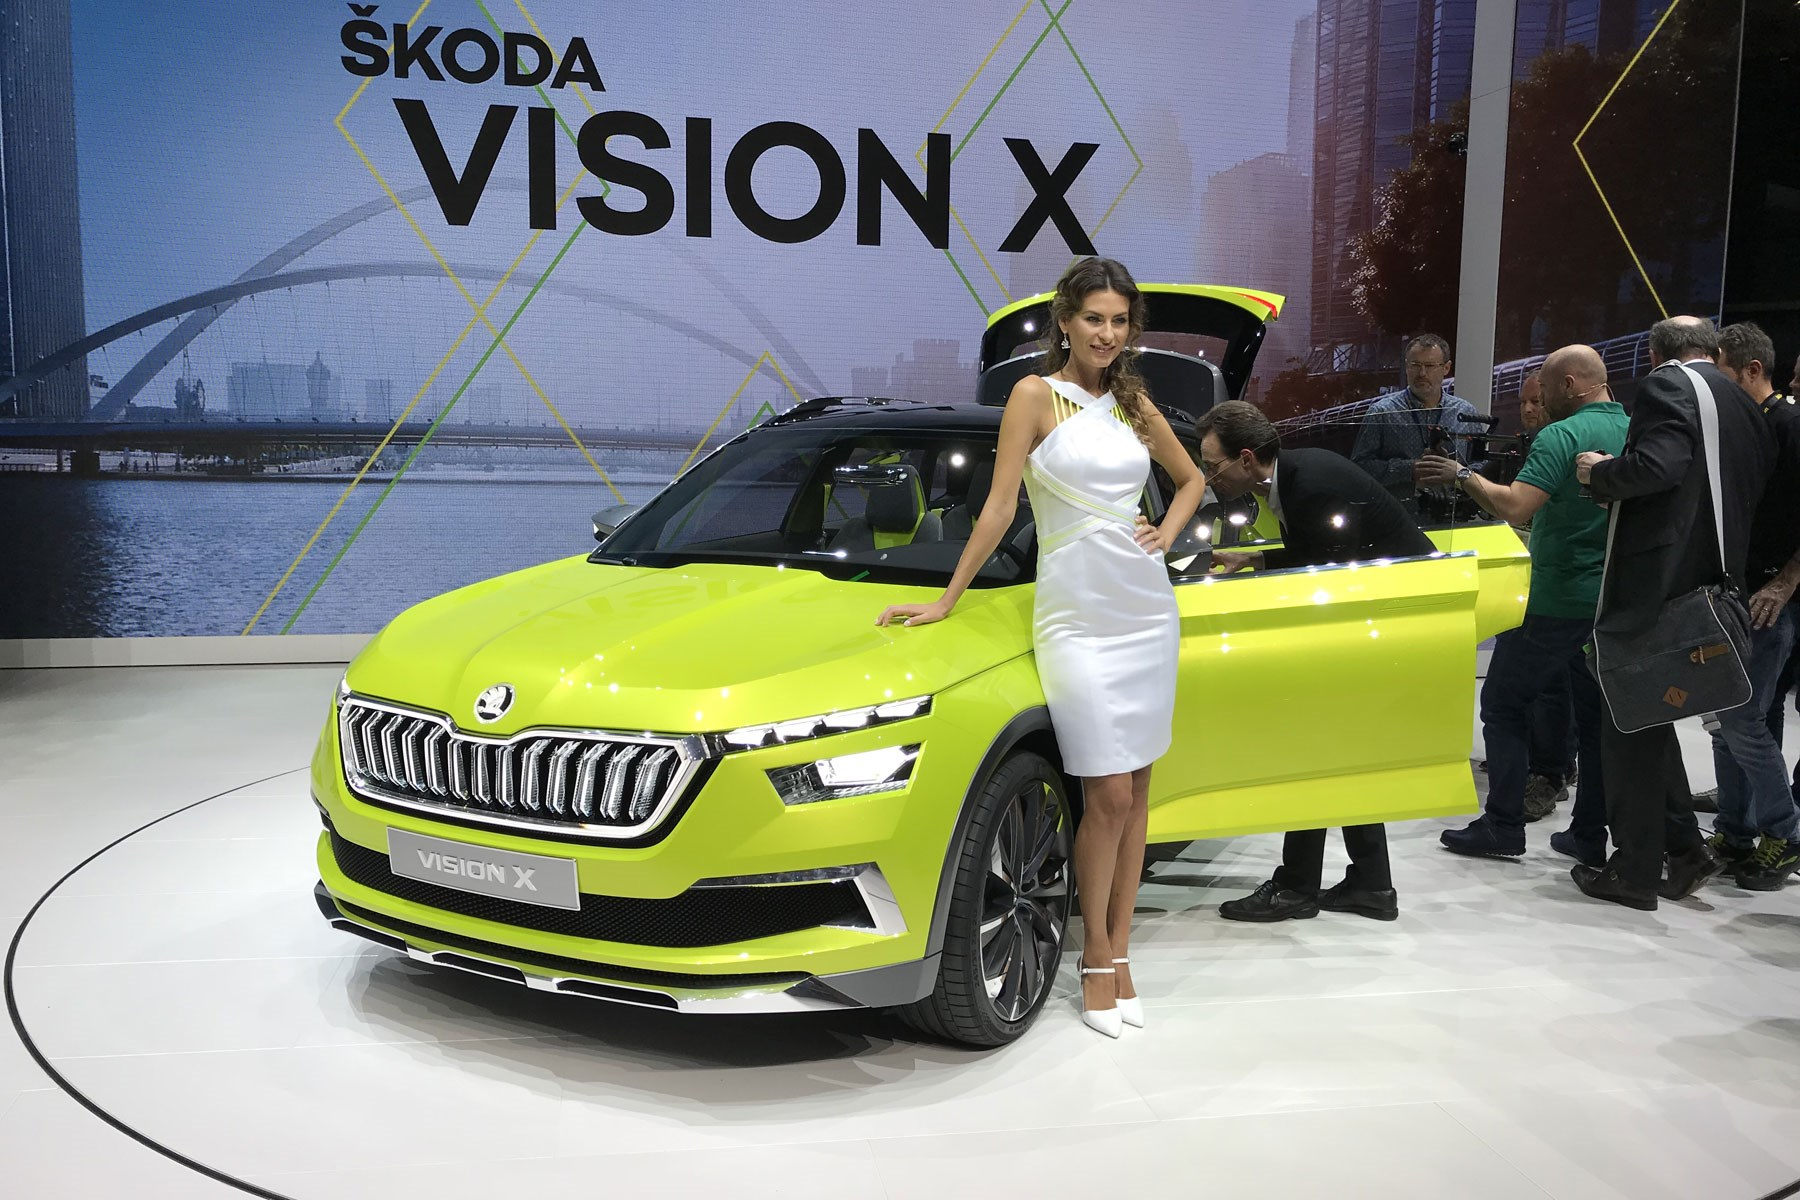 Skoda Vision X Concept Suv Pics Specs And Details Car Magazine